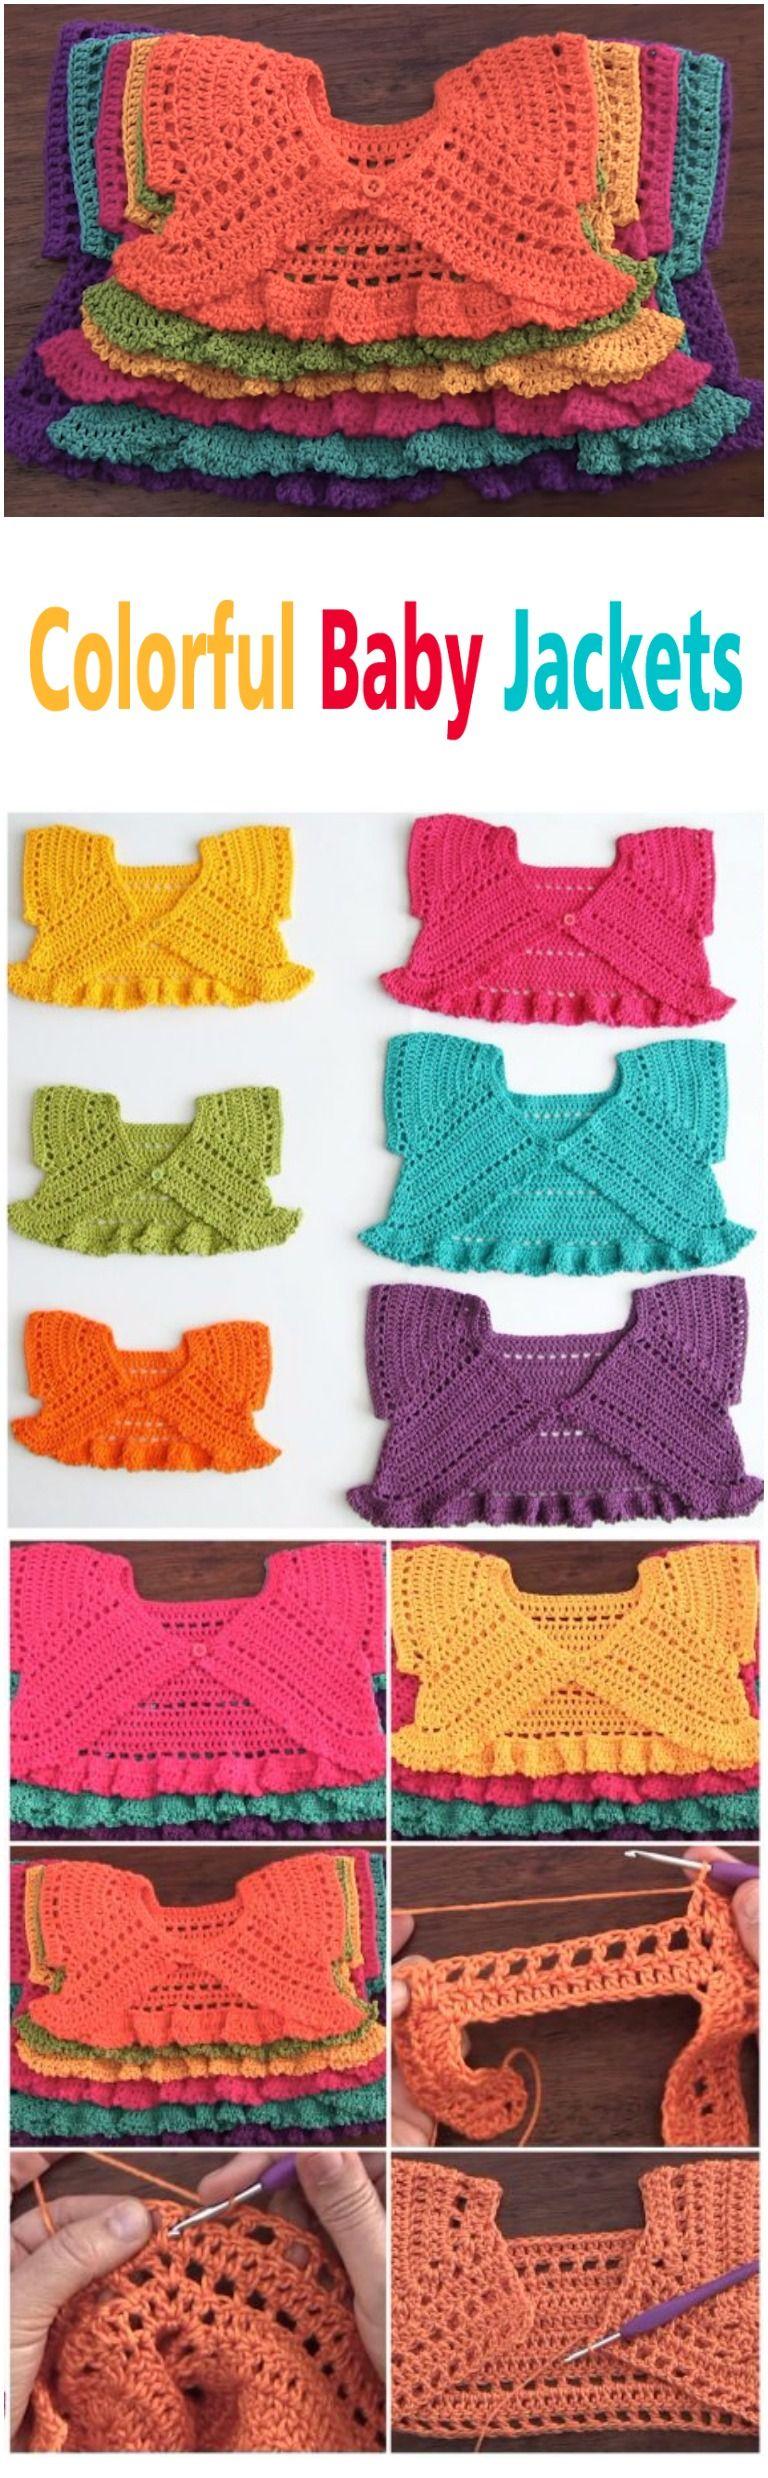 Crochet Colorful Baby Jackets Tutorial   Bolero häkeln ...